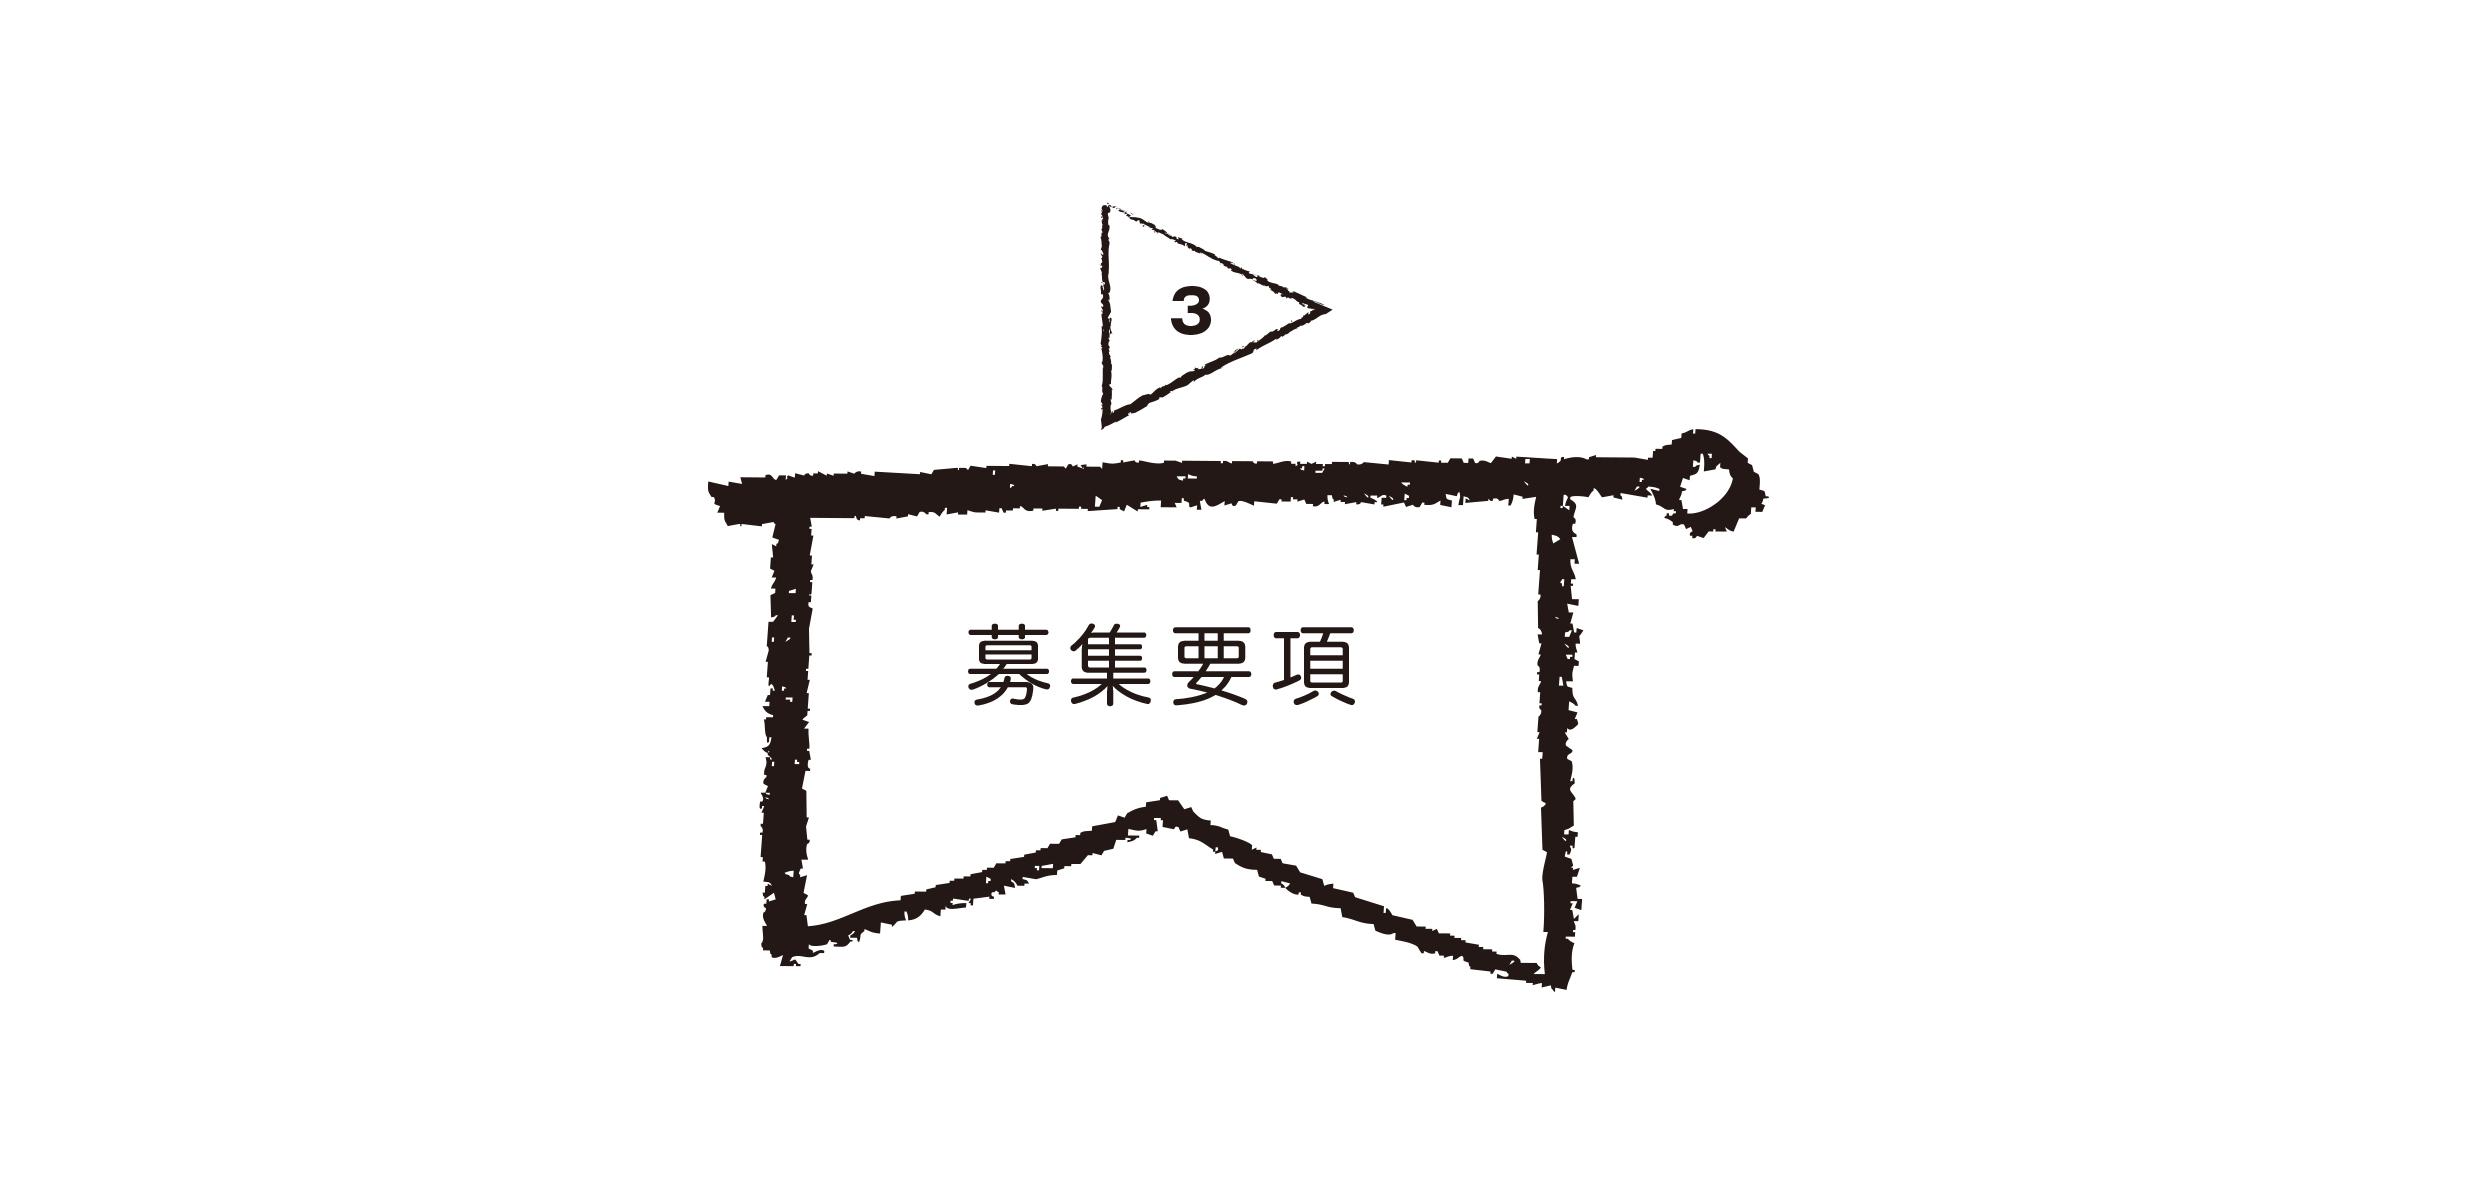 T3-1.jpg